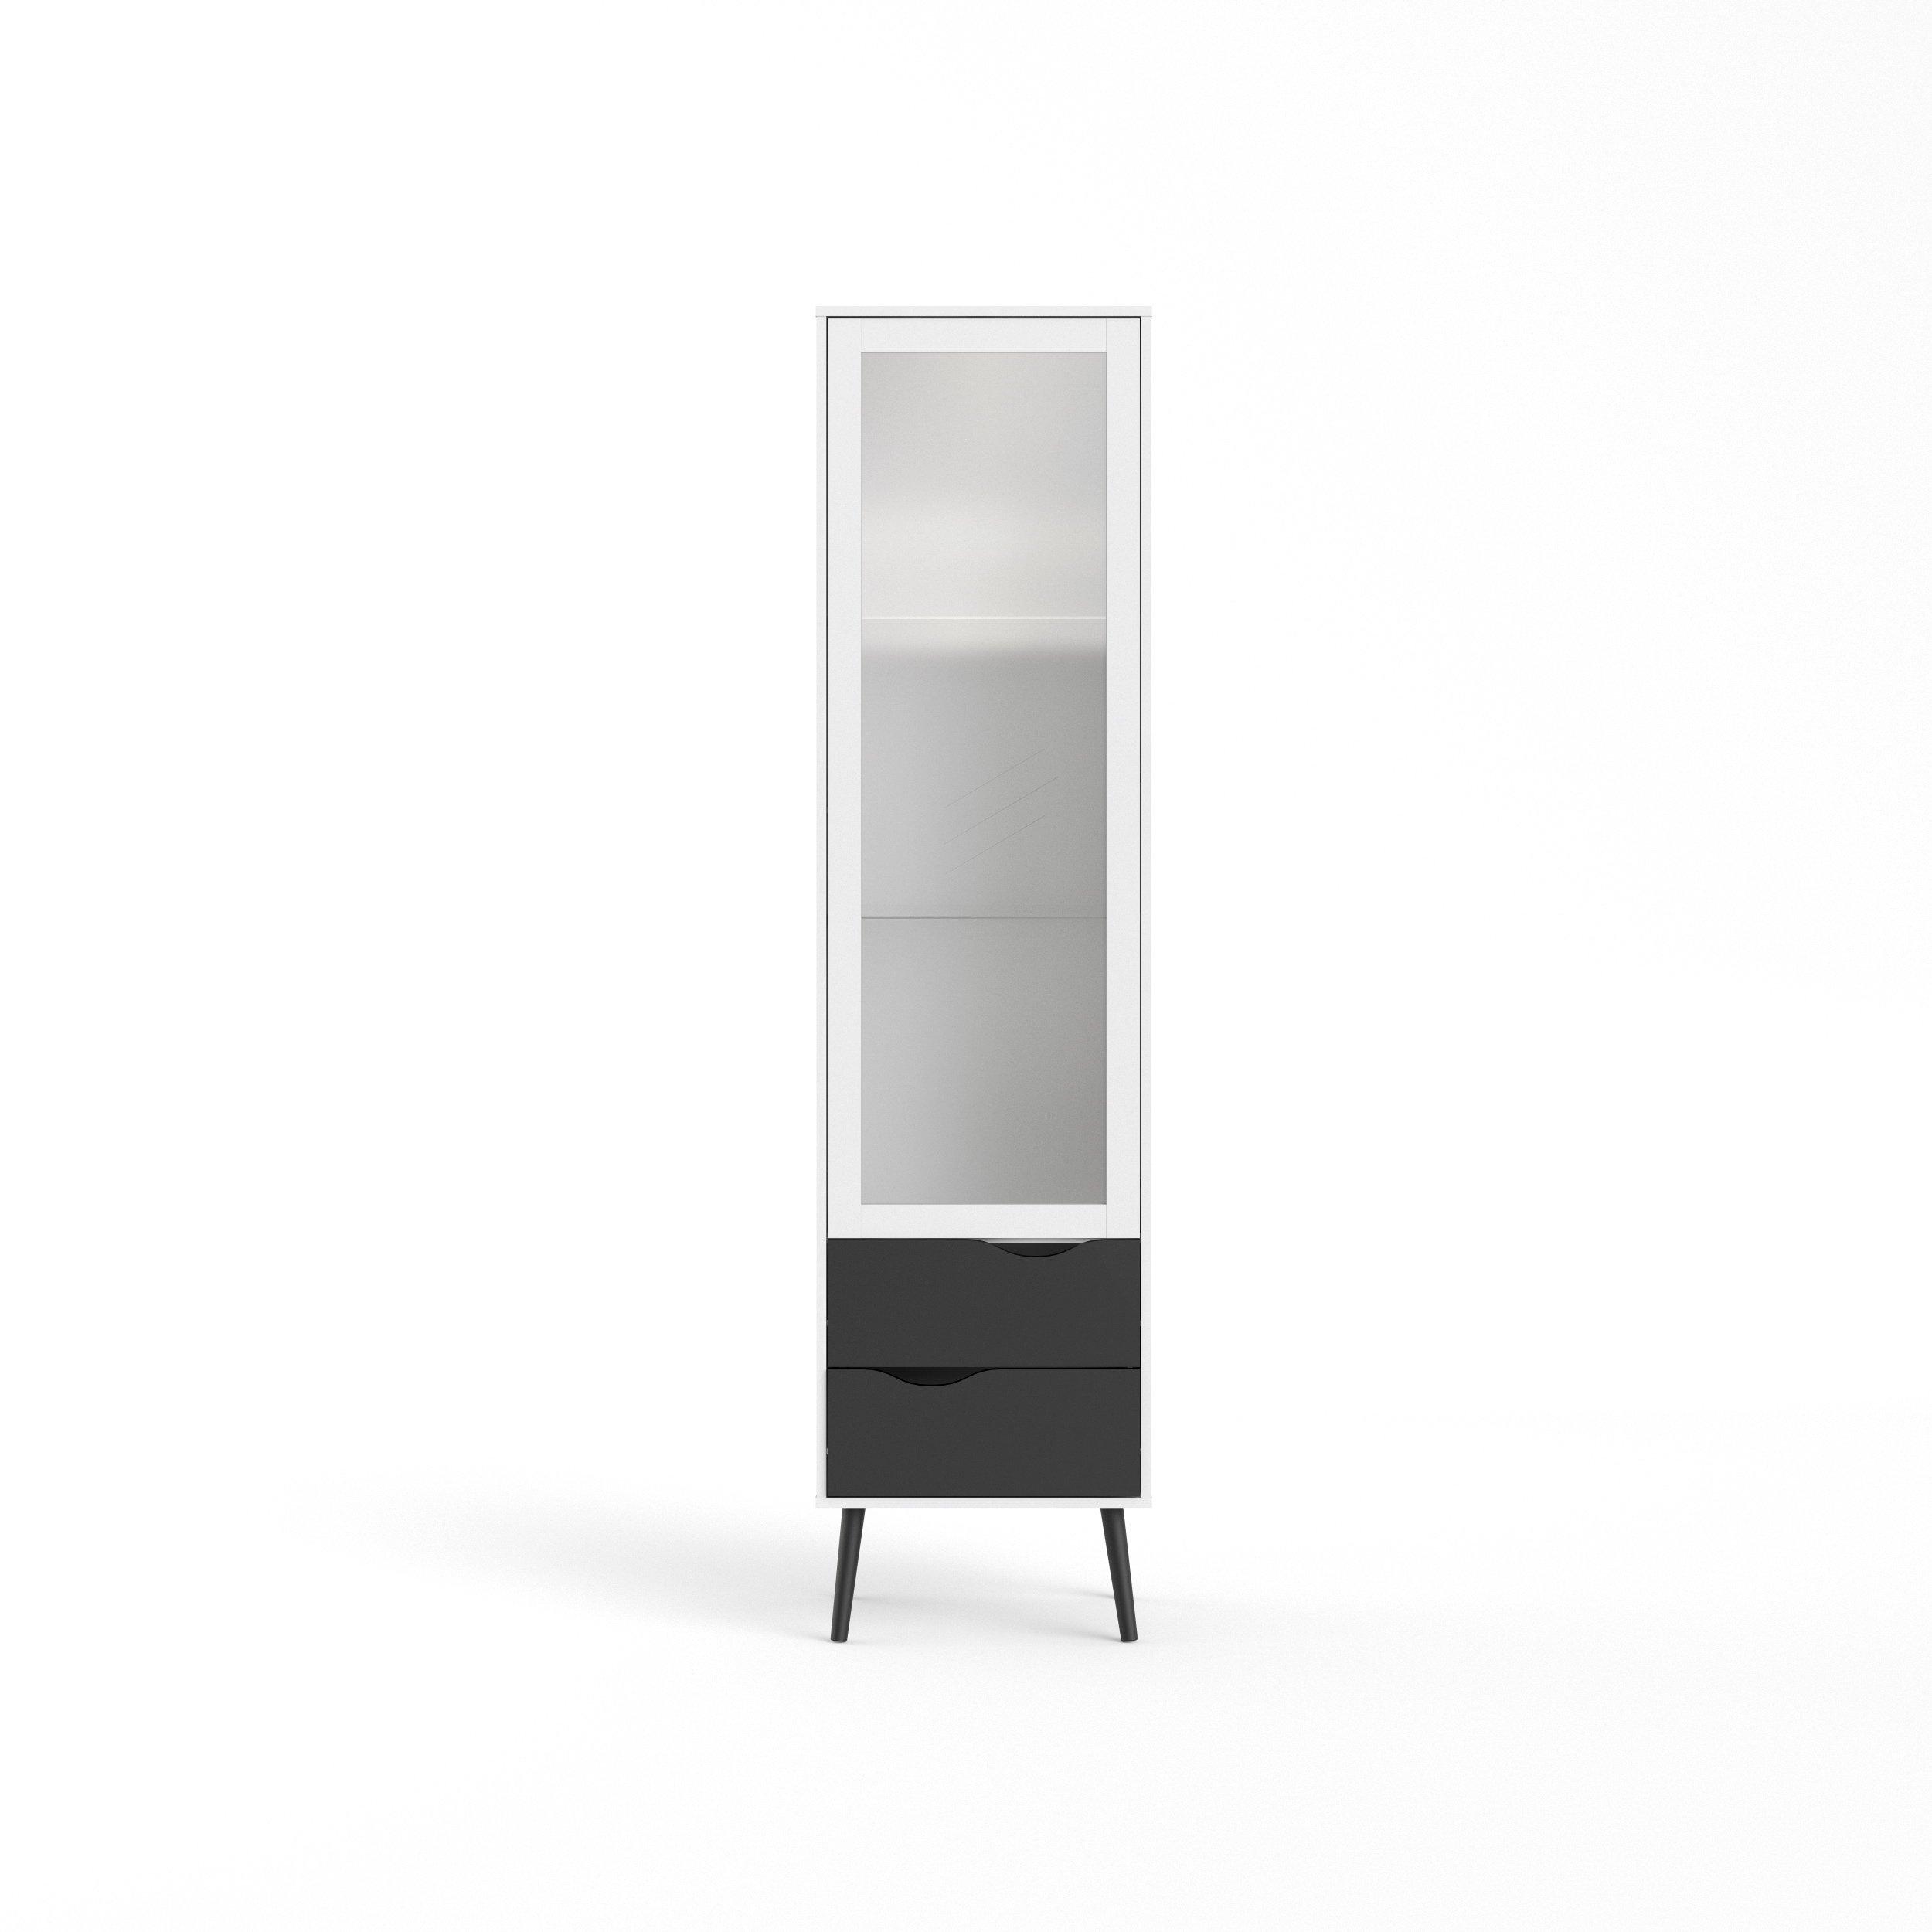 Tvilum 7546149gm Diana 2 Drawer and and 1 Door Glass China Cabinet, White/Black Matte